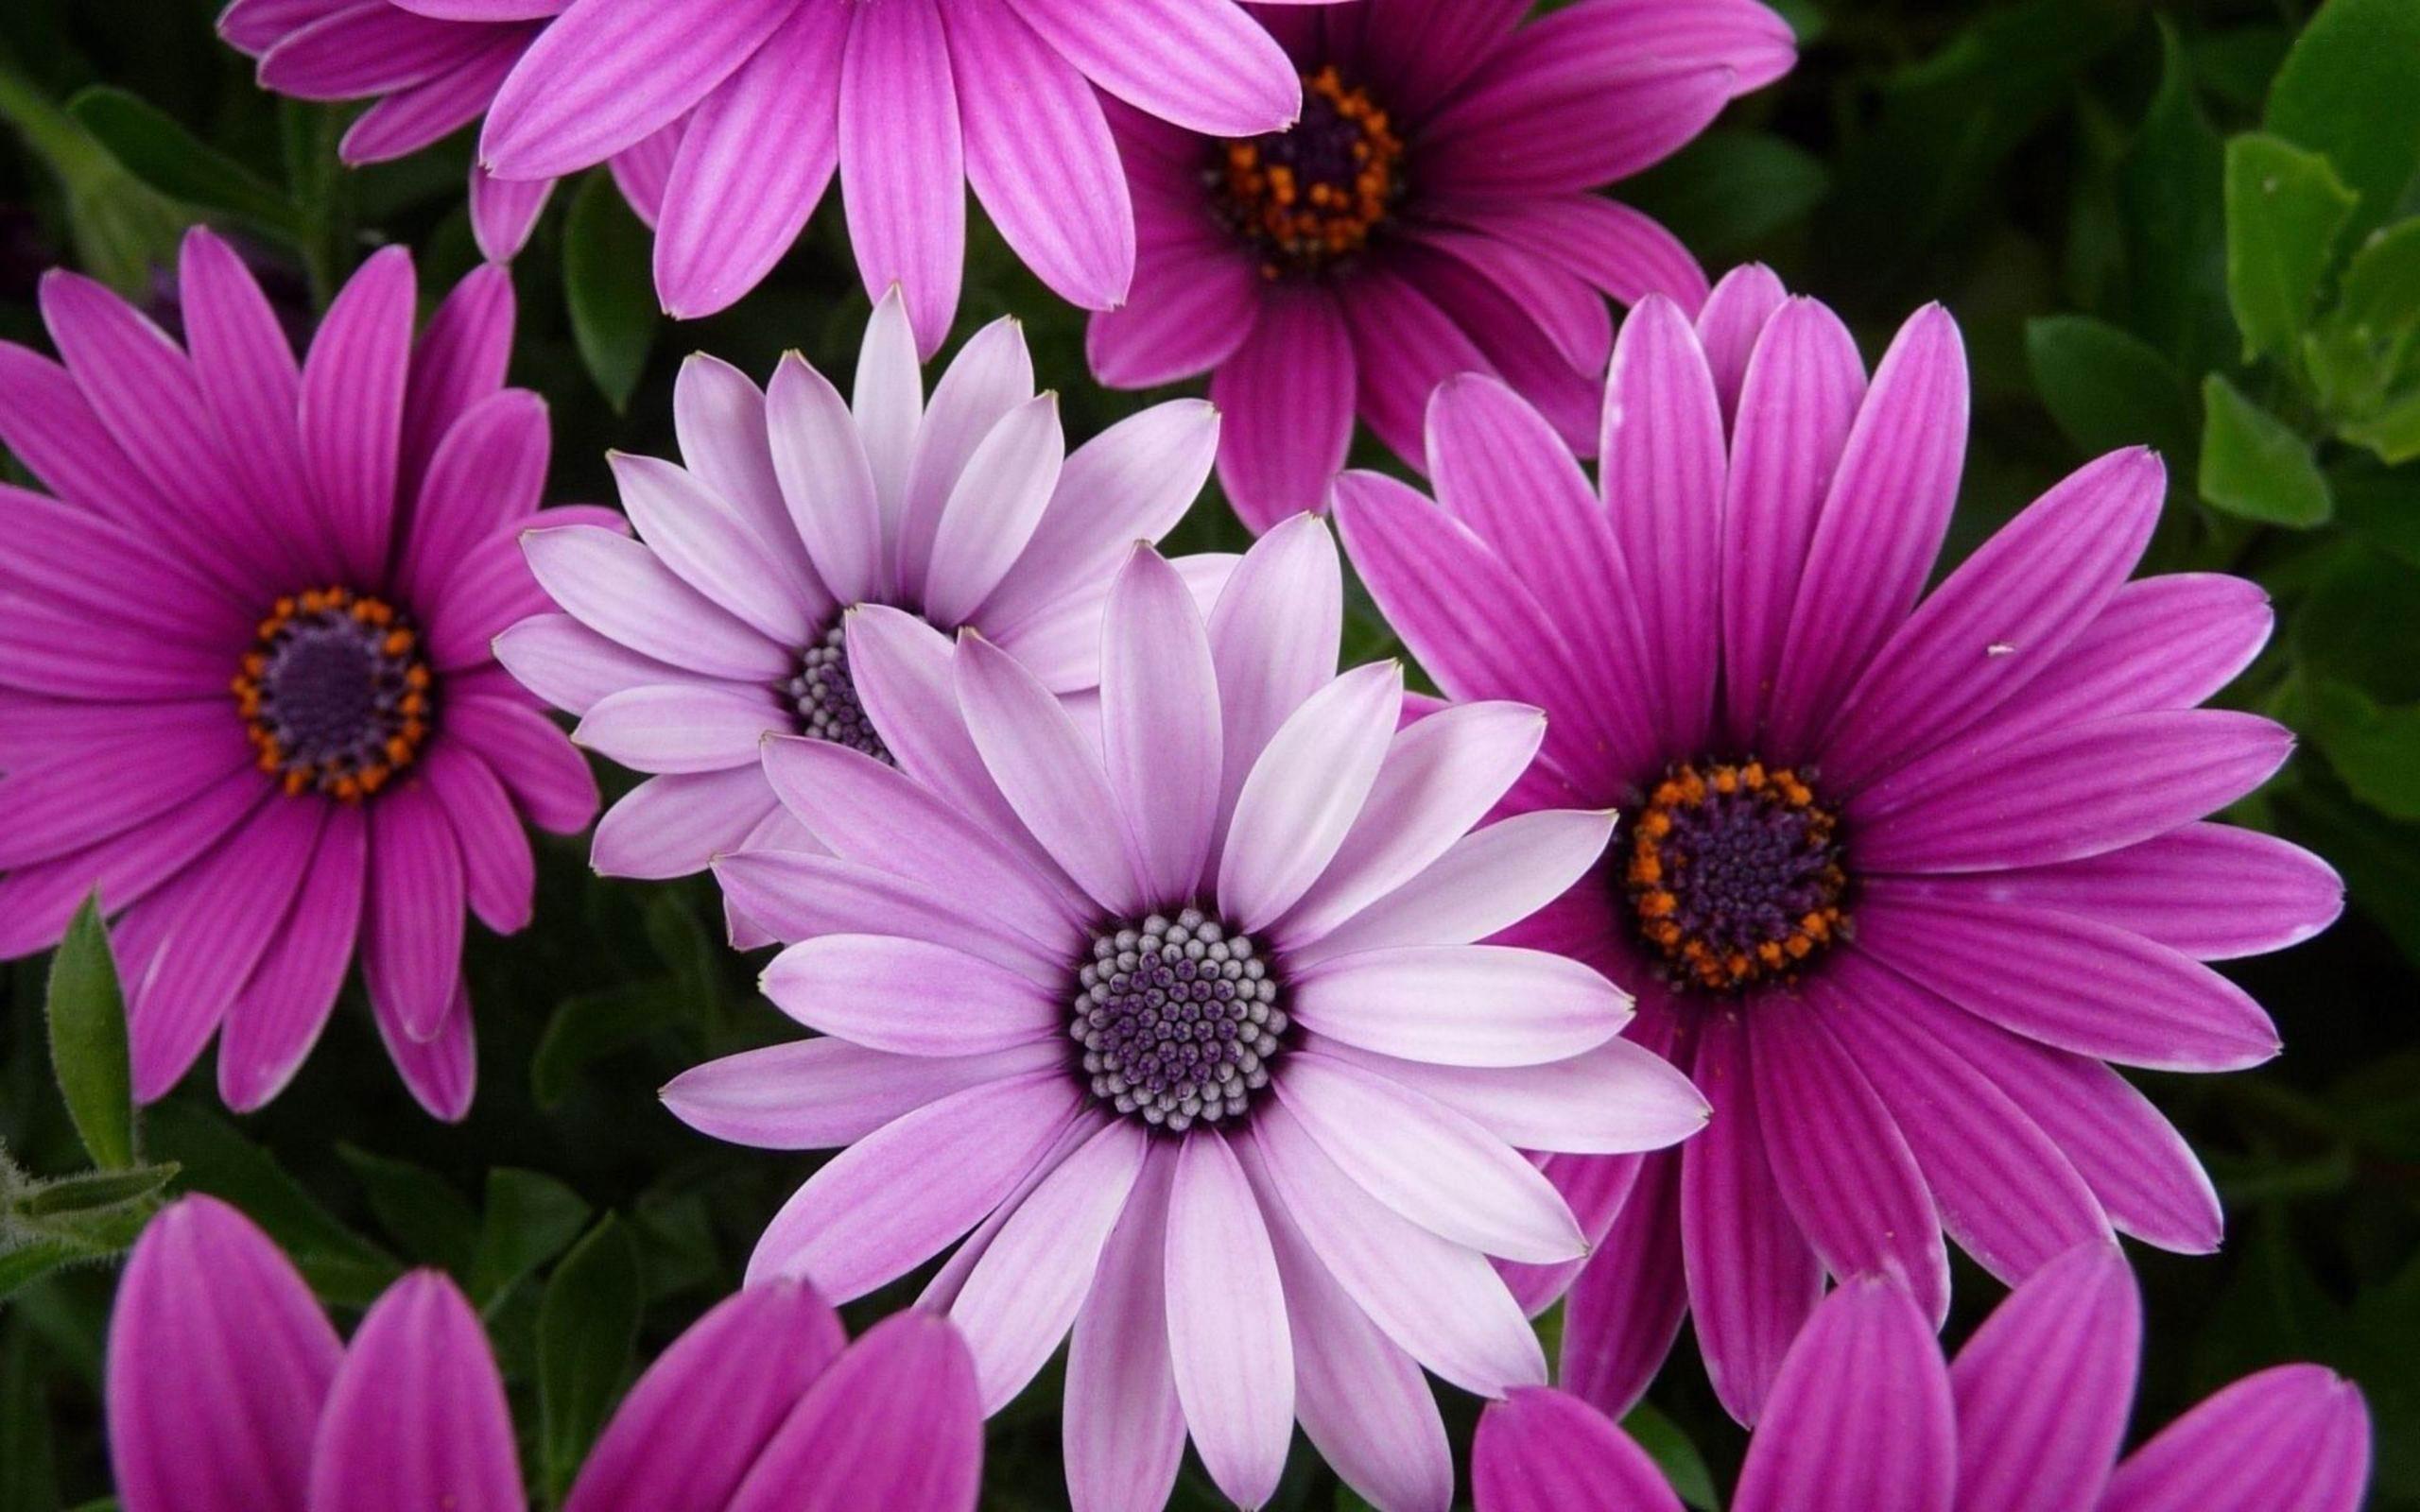 flower laptop wallpaper,flower,flowering plant,petal,african daisy,plant